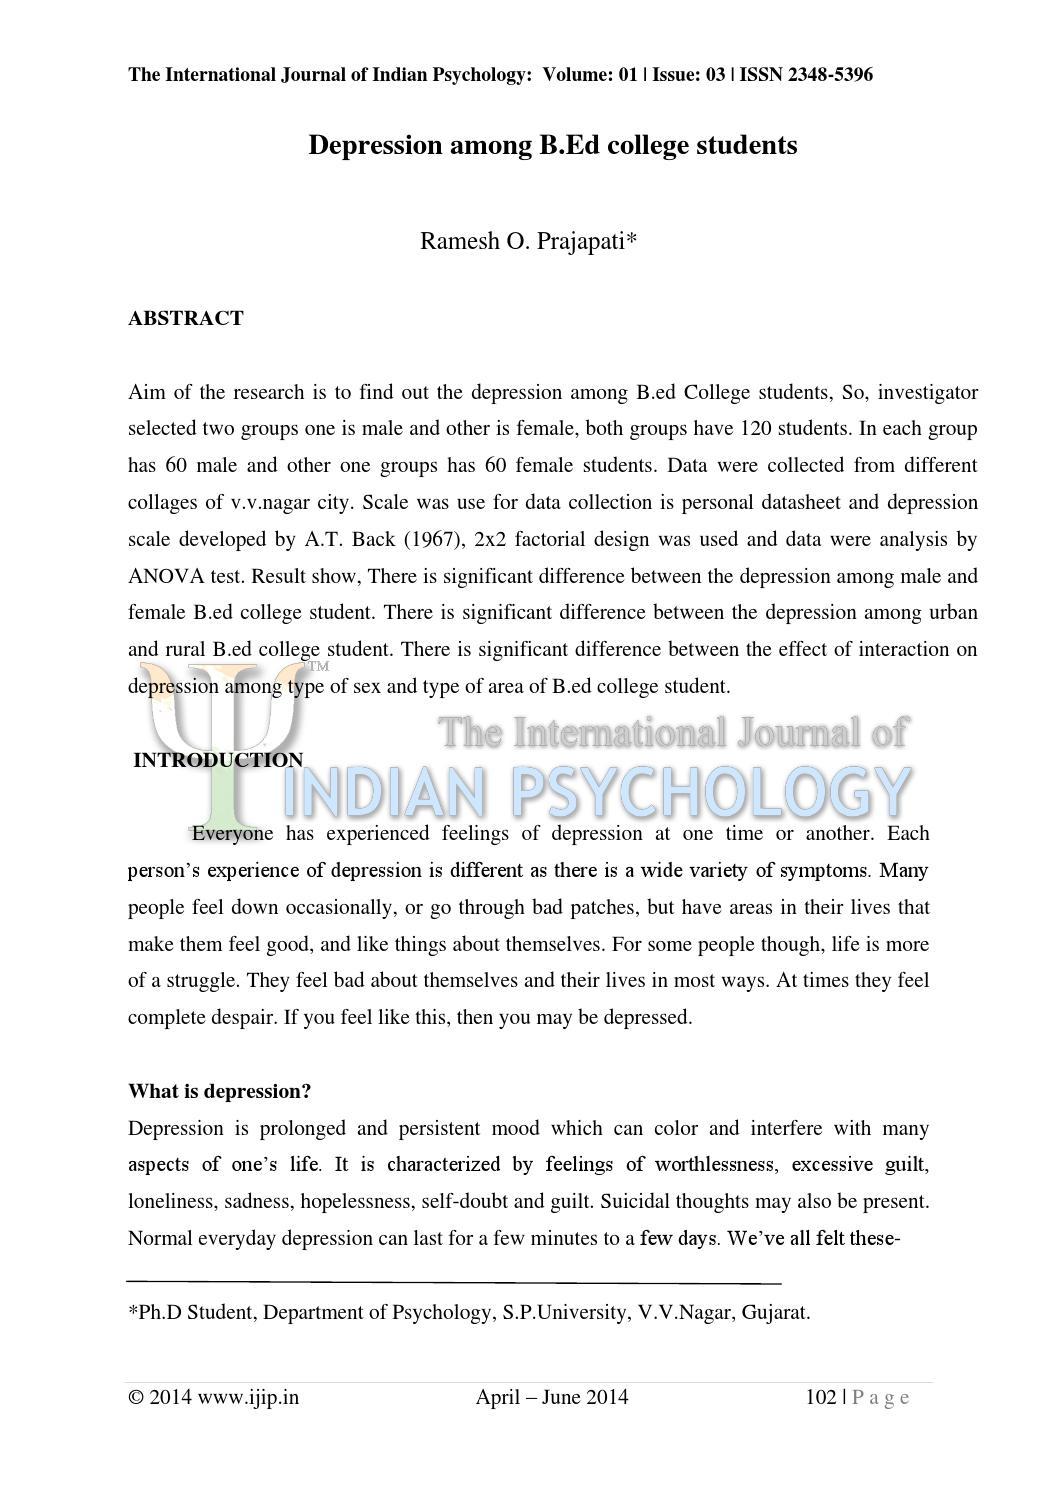 The international journal of indian psychology- volume 1